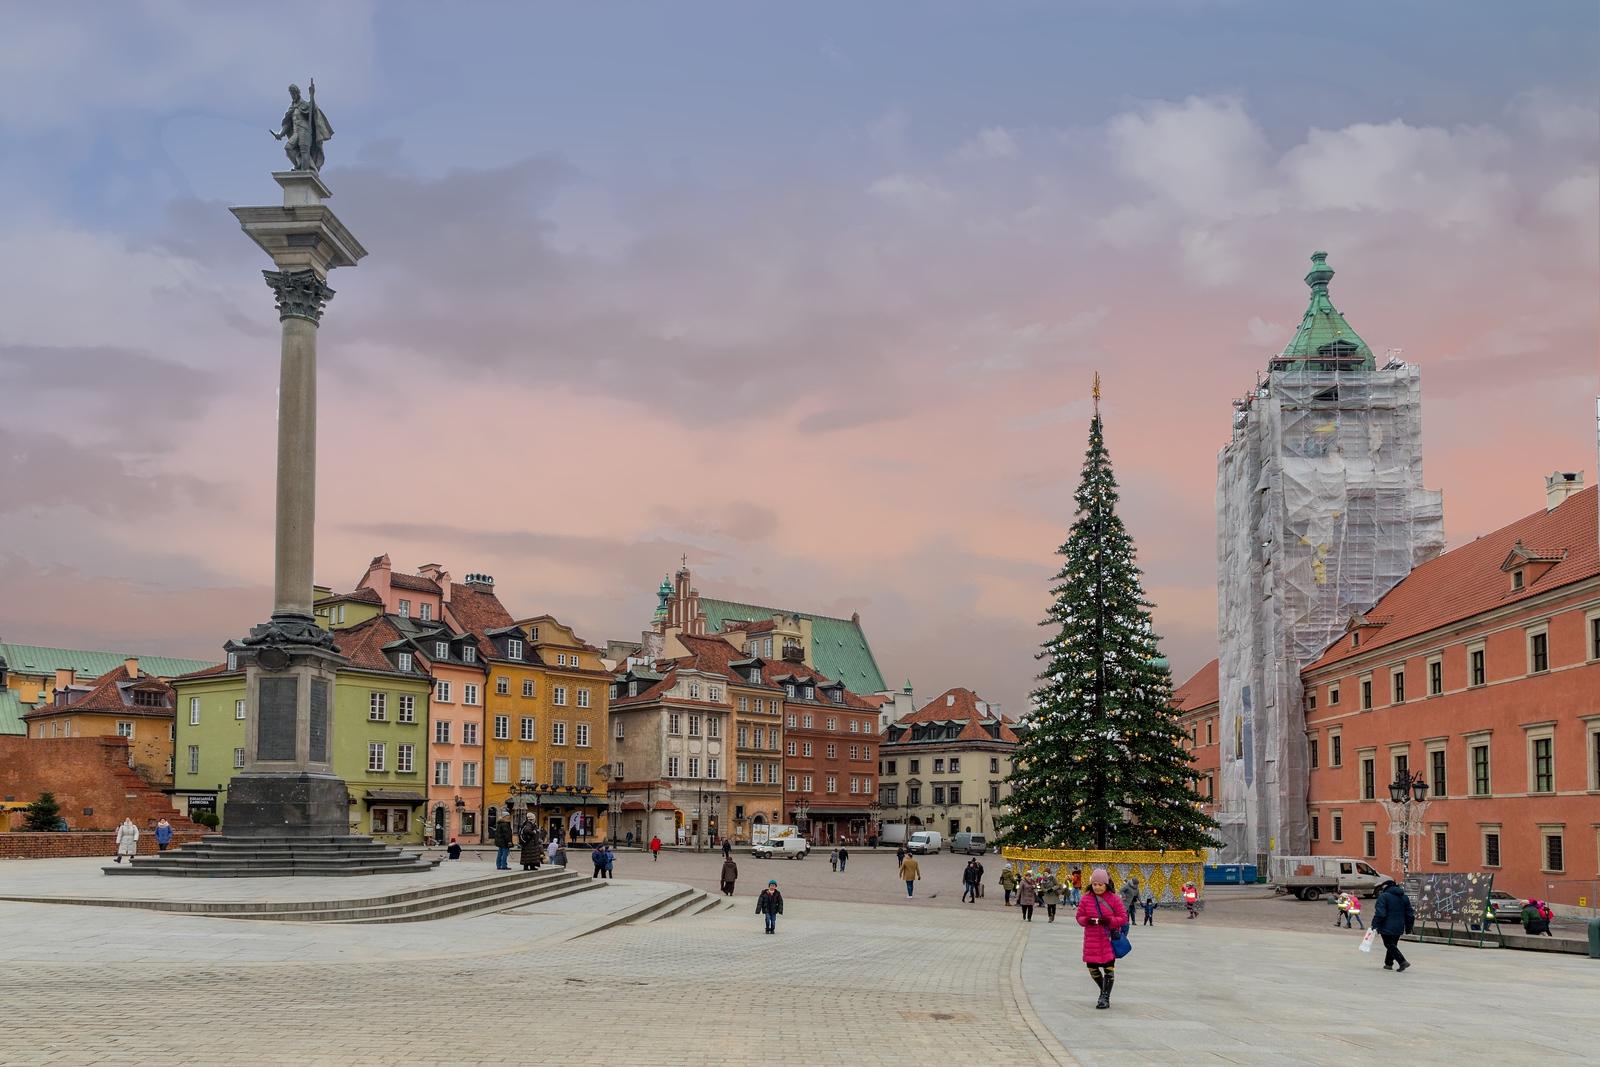 IMG_2041 - Warsaw (landscape pro)